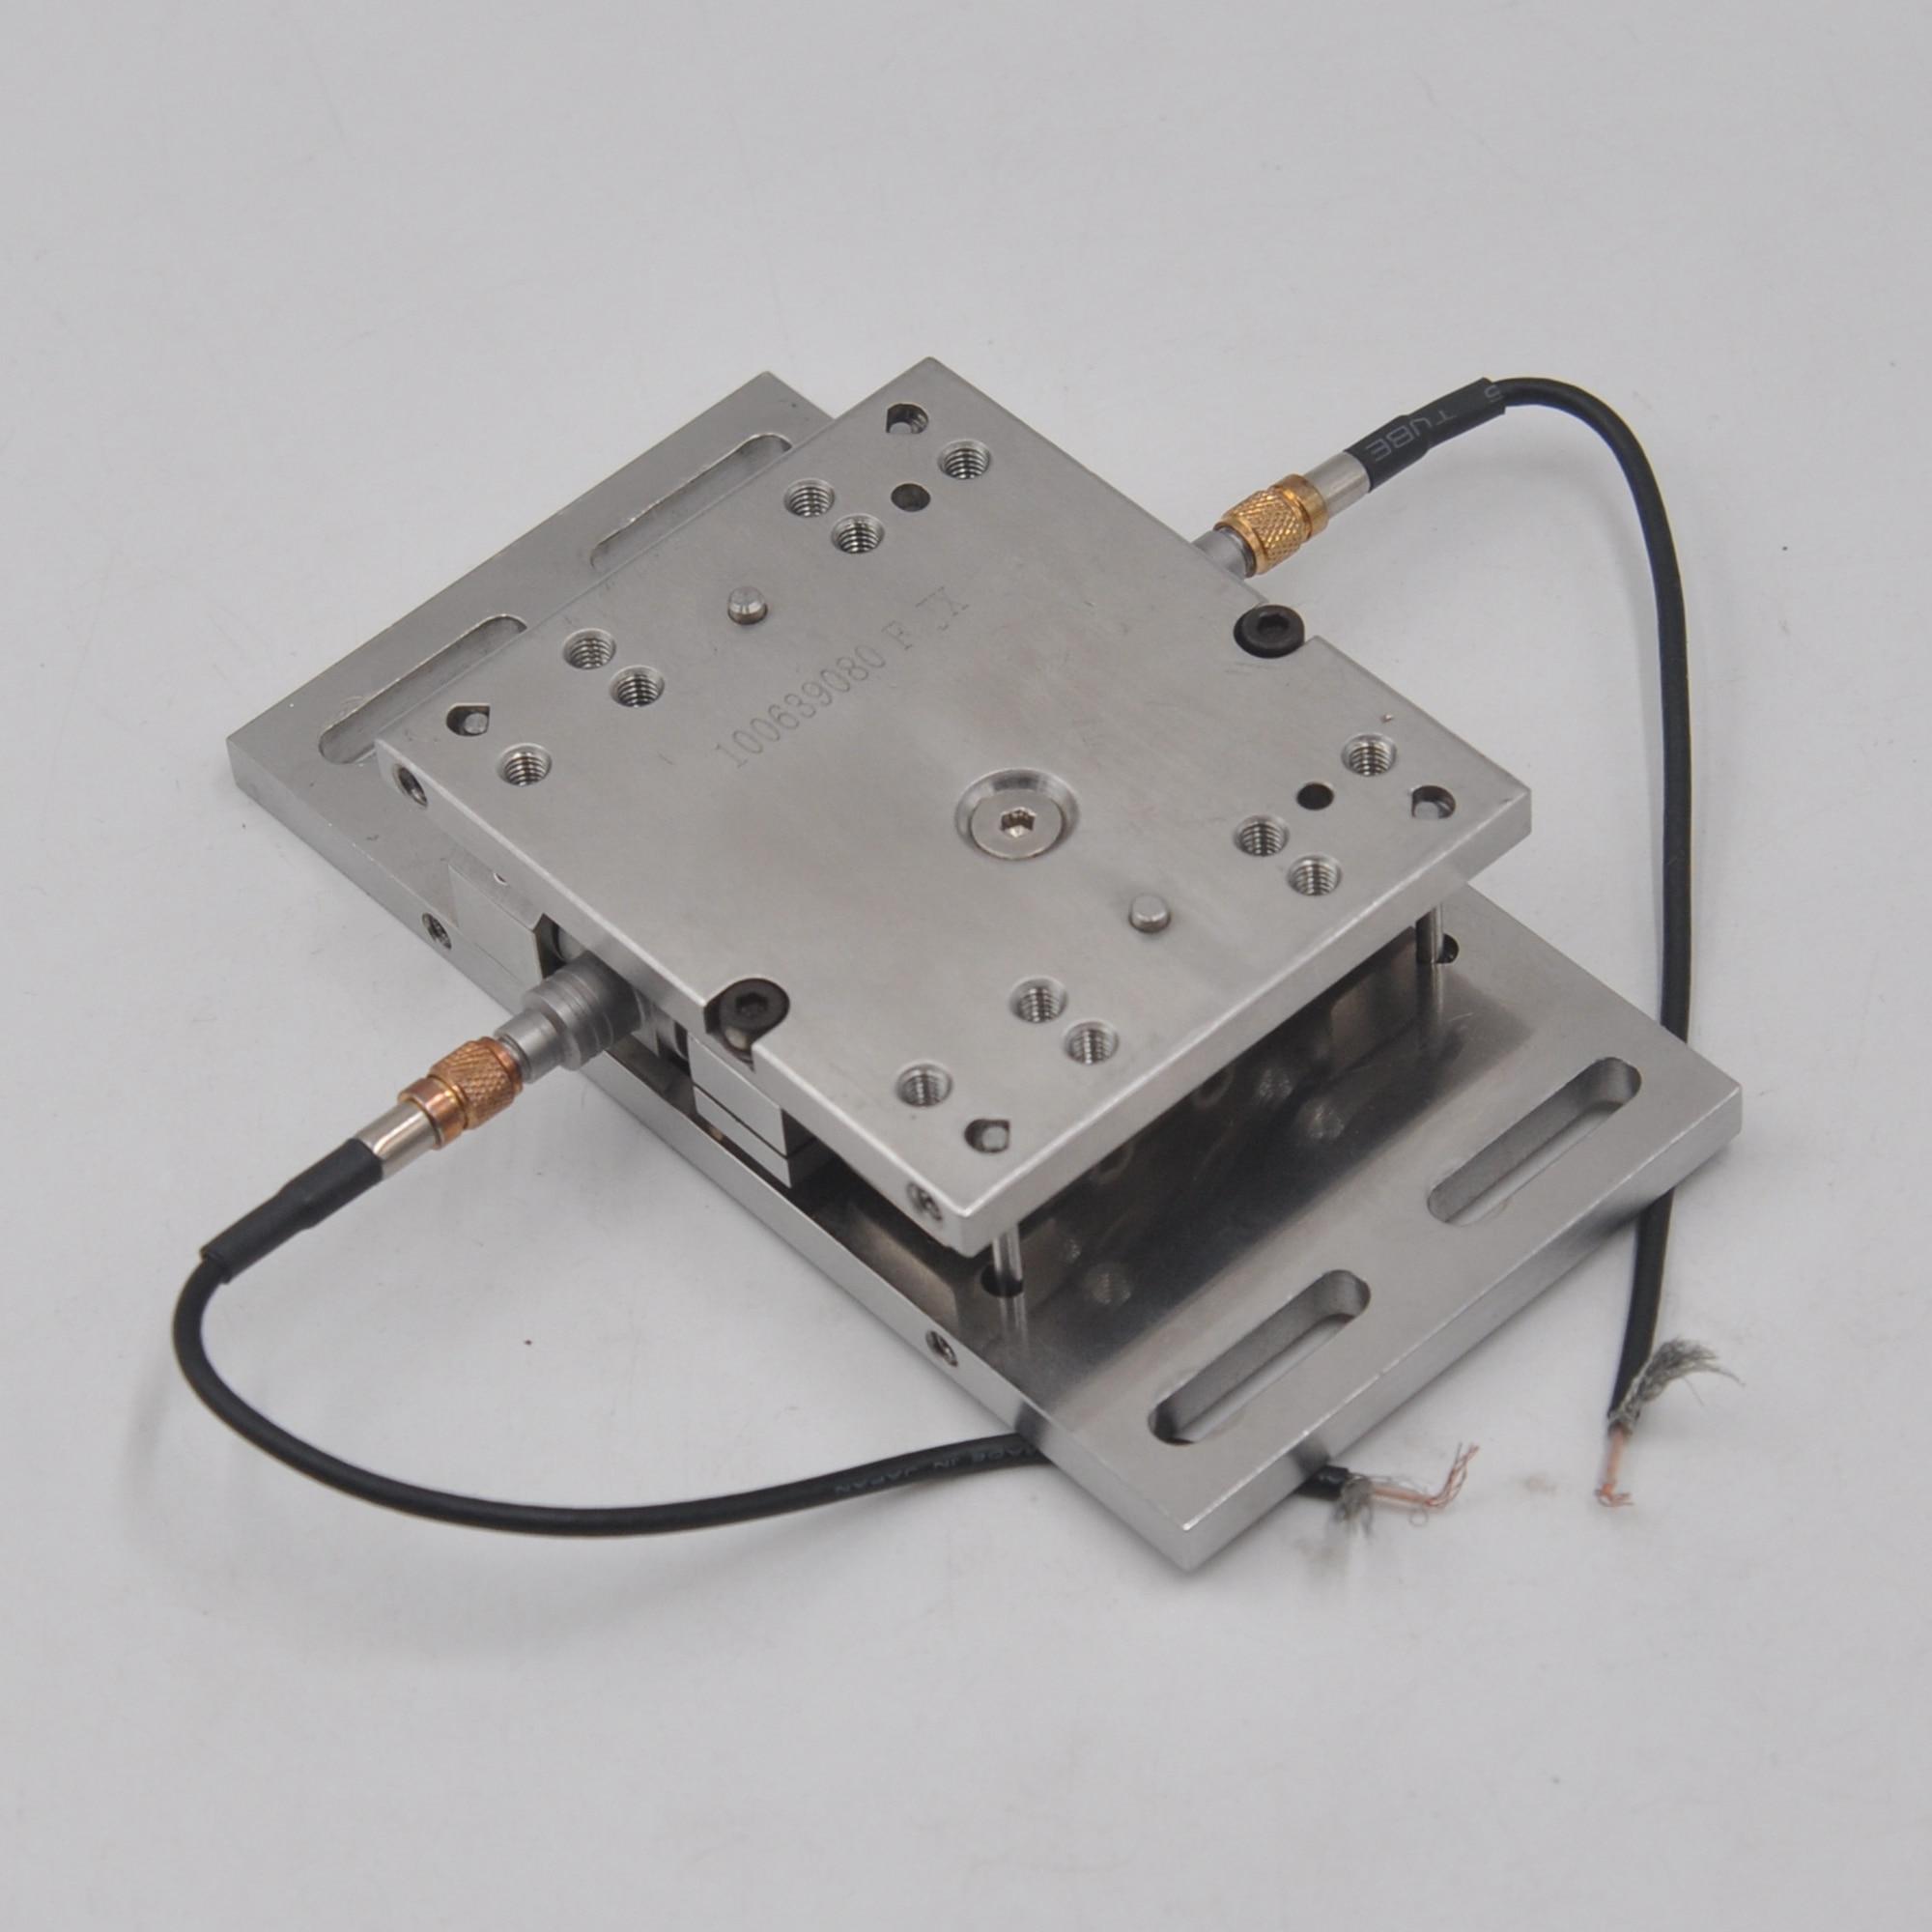 PCG 100639088-C M049E XY vibration sensor speed sensor displacement table Stainless steel